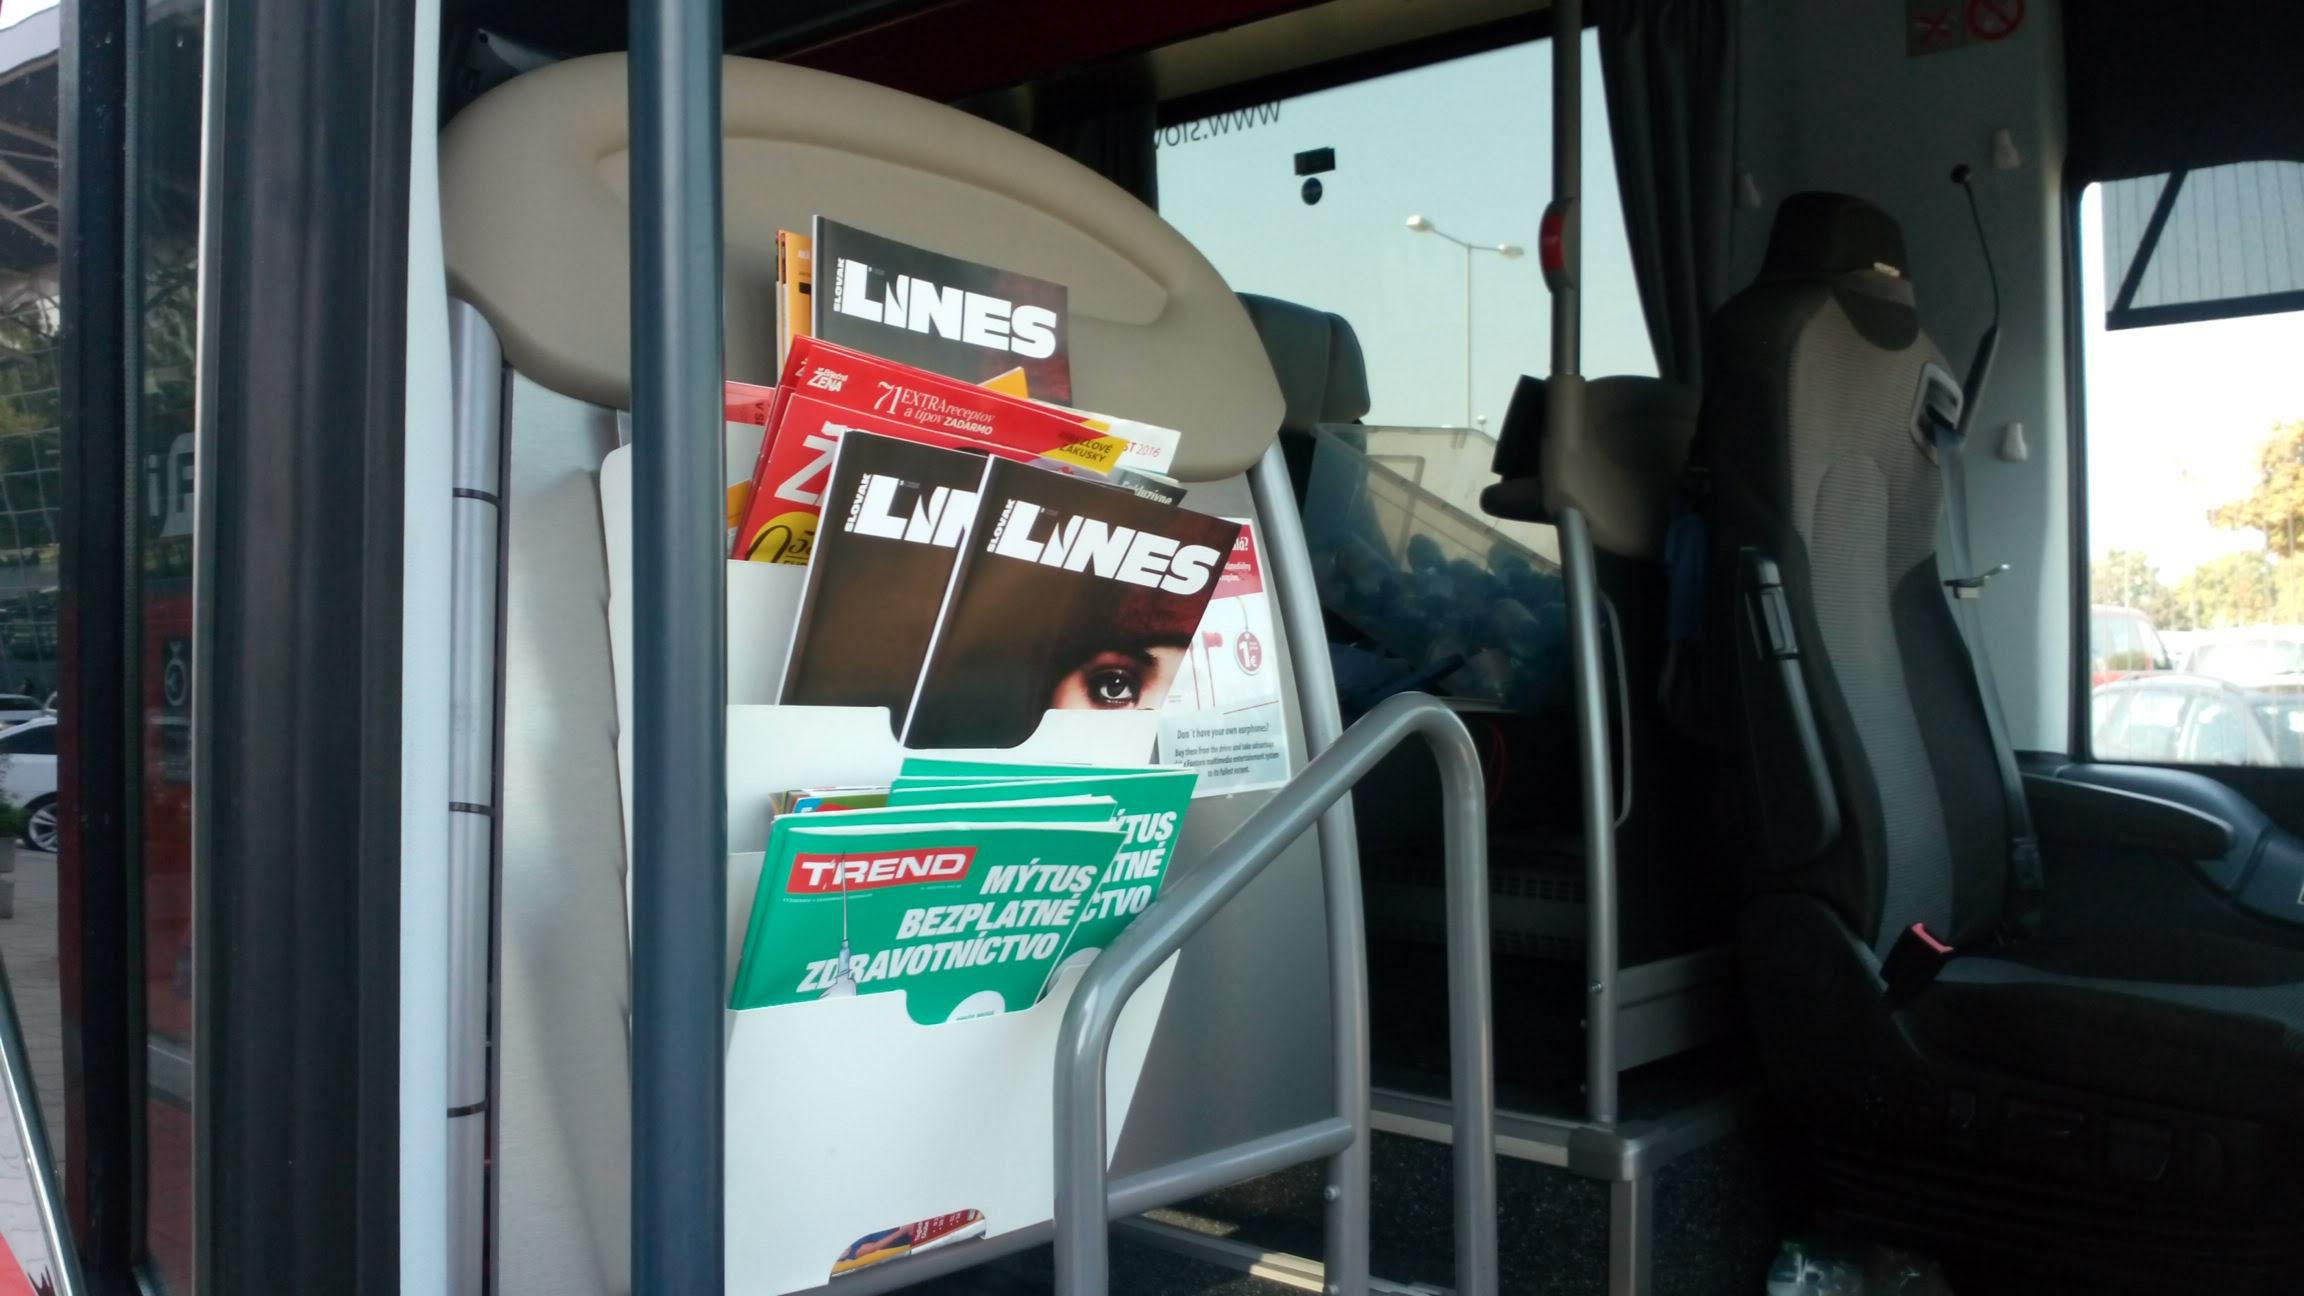 In Drive magazin Slovak Lines